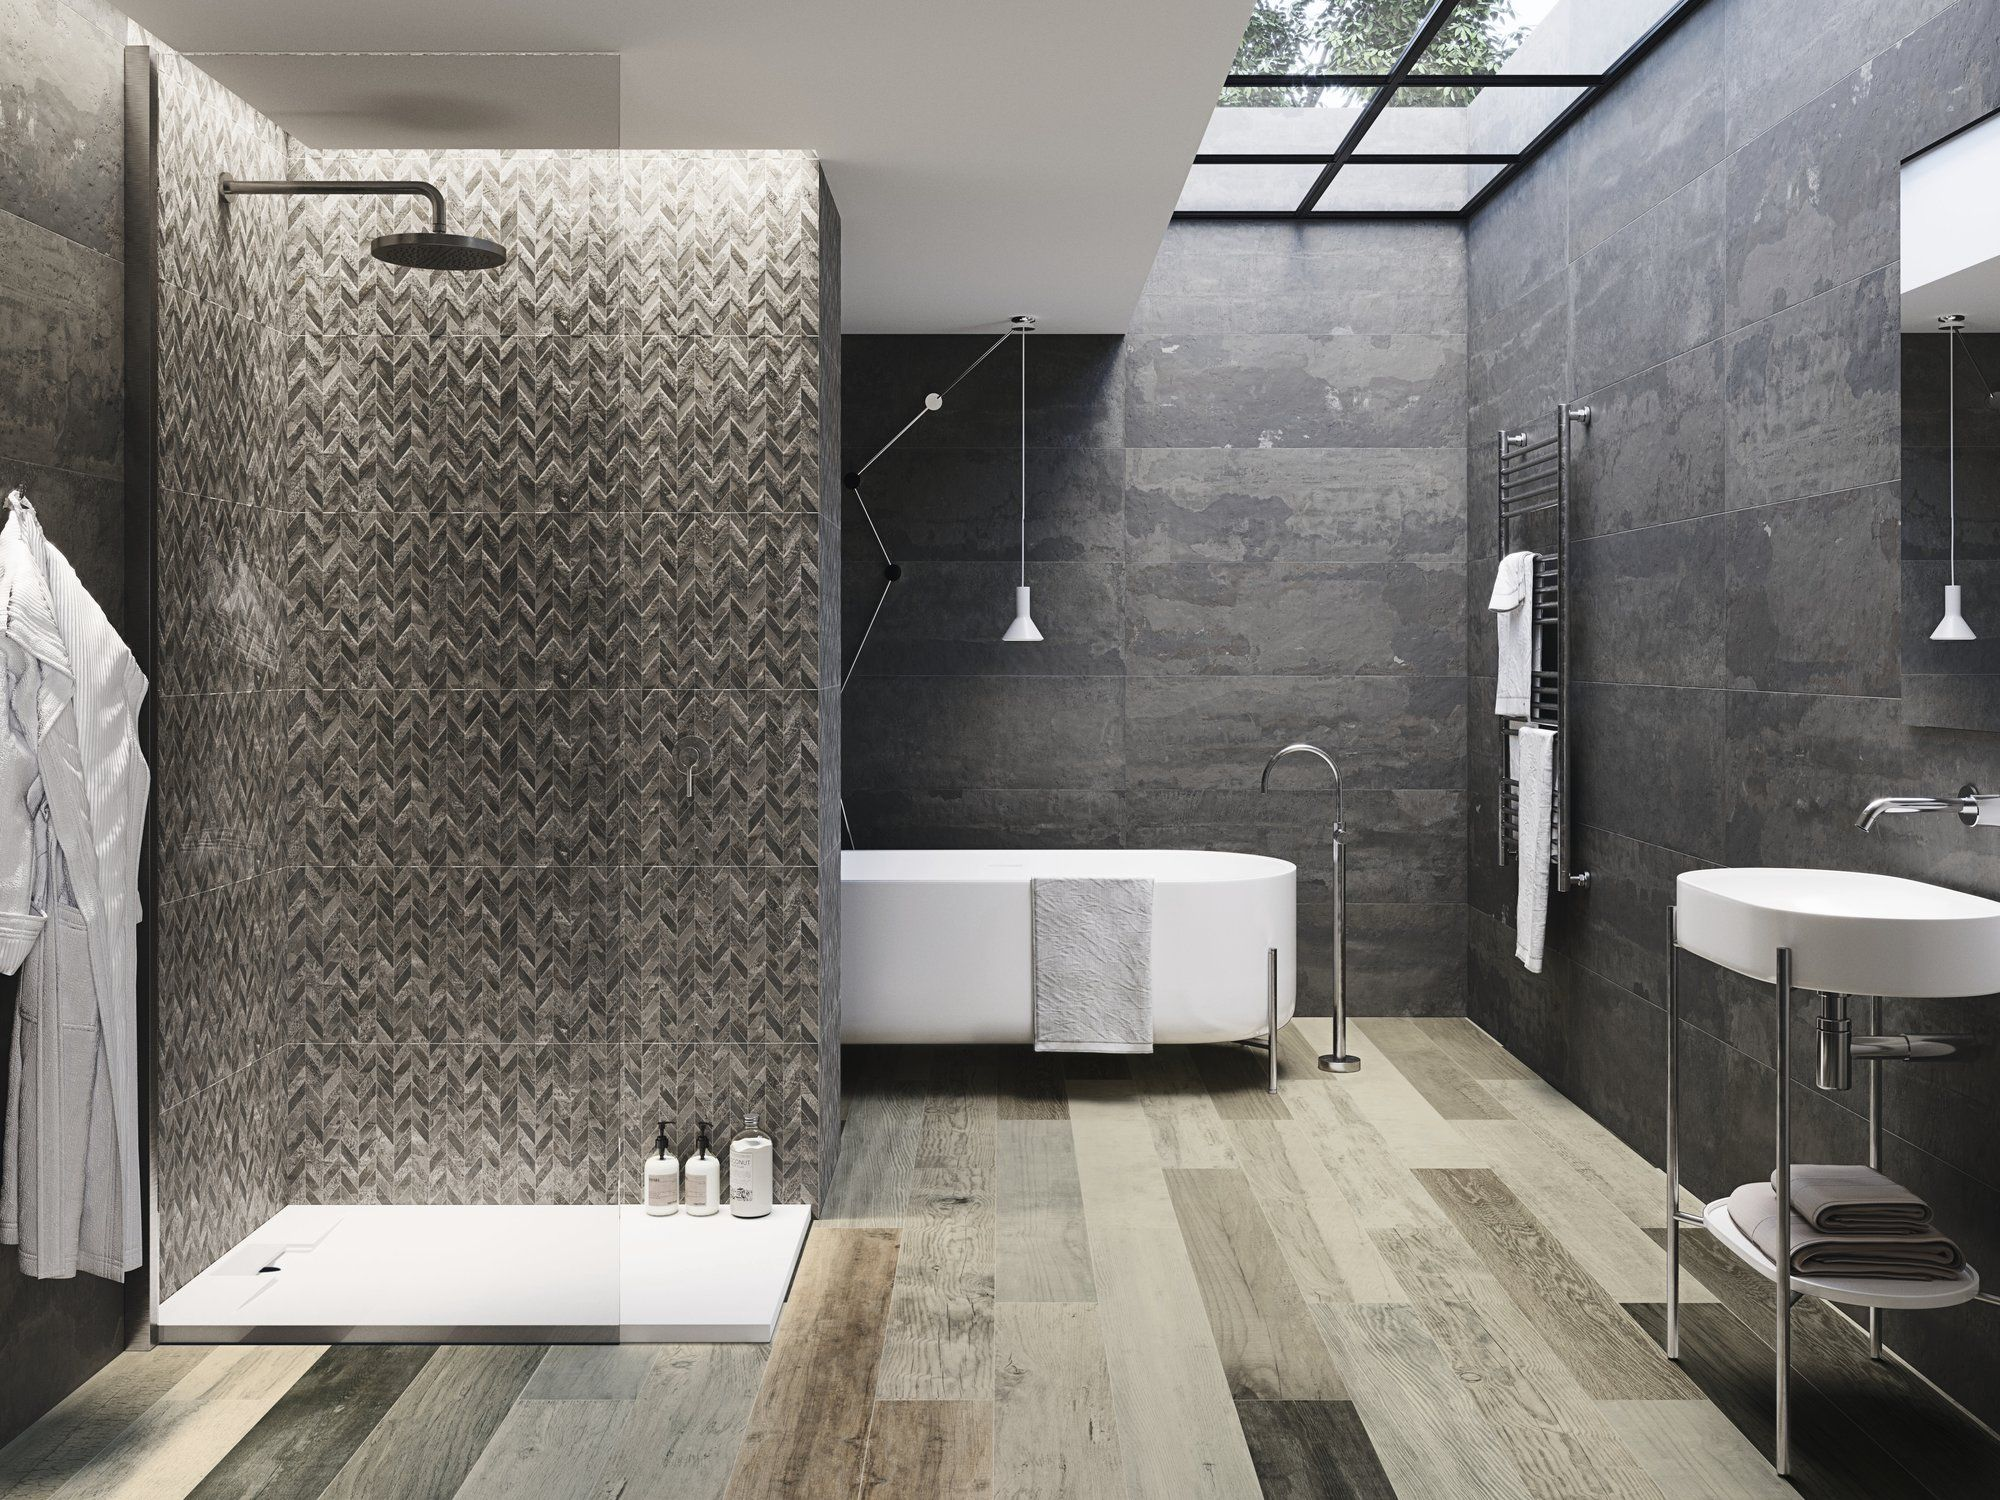 Badkamer Tegel Betonlook : Promotie wandtegel betonlook evo amazing tegels badkamer tegel